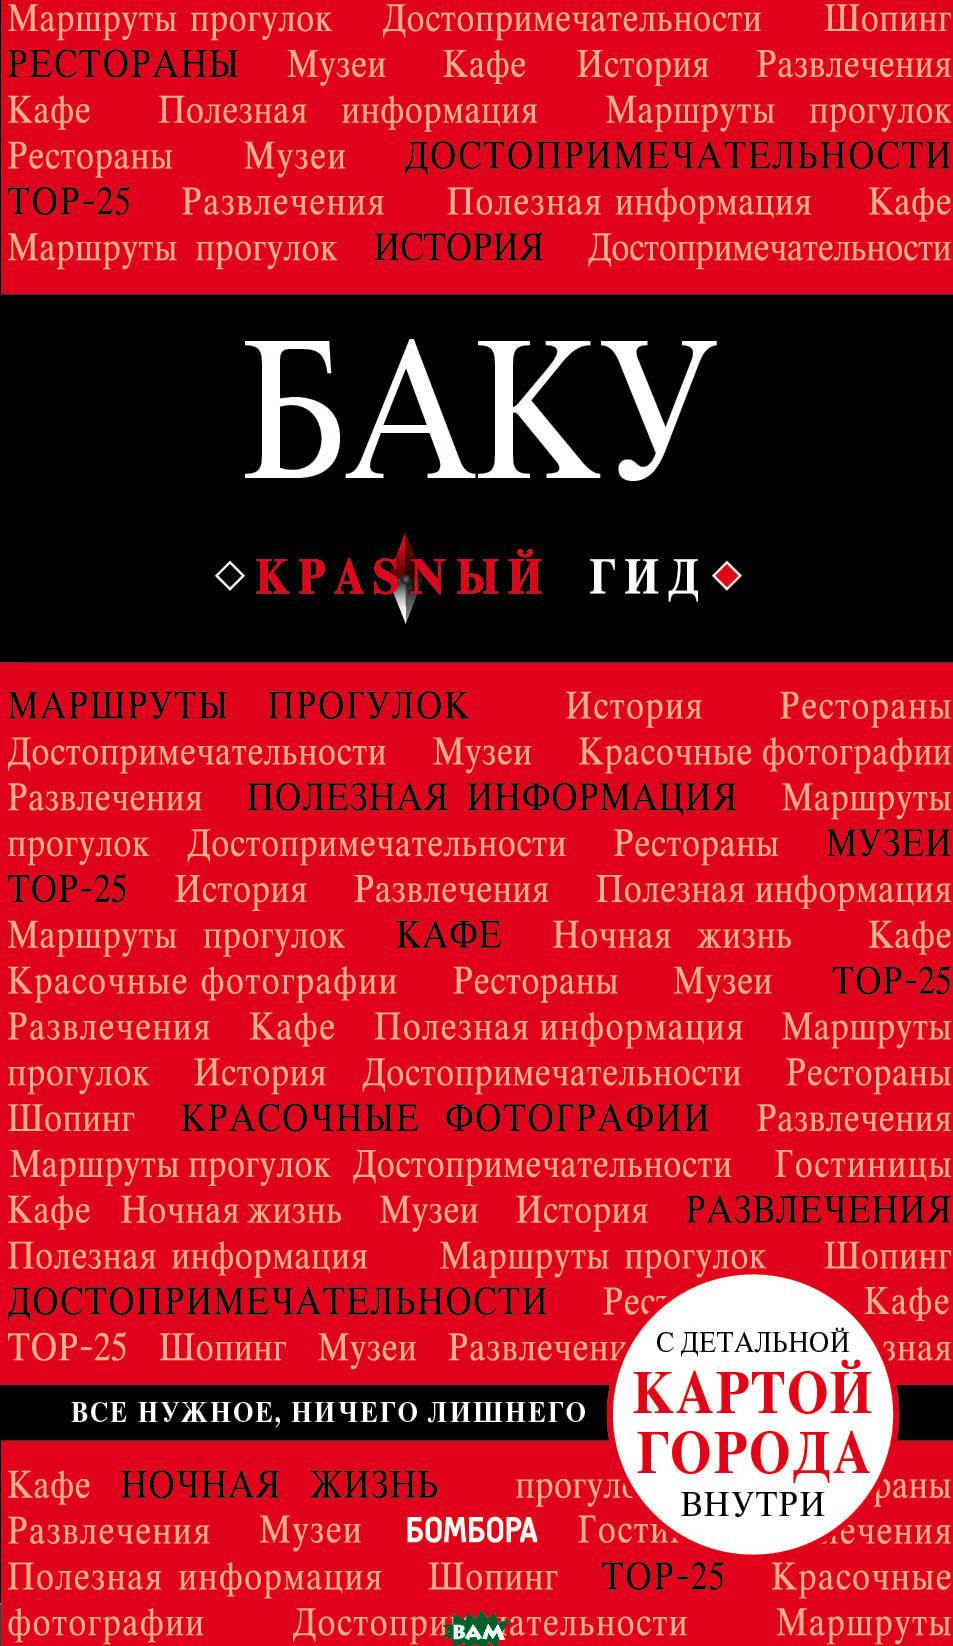 Купить Баку. 2-е изд., испр. и доп., Бомбора, Сахарова А.К., 978-5-04-097864-9